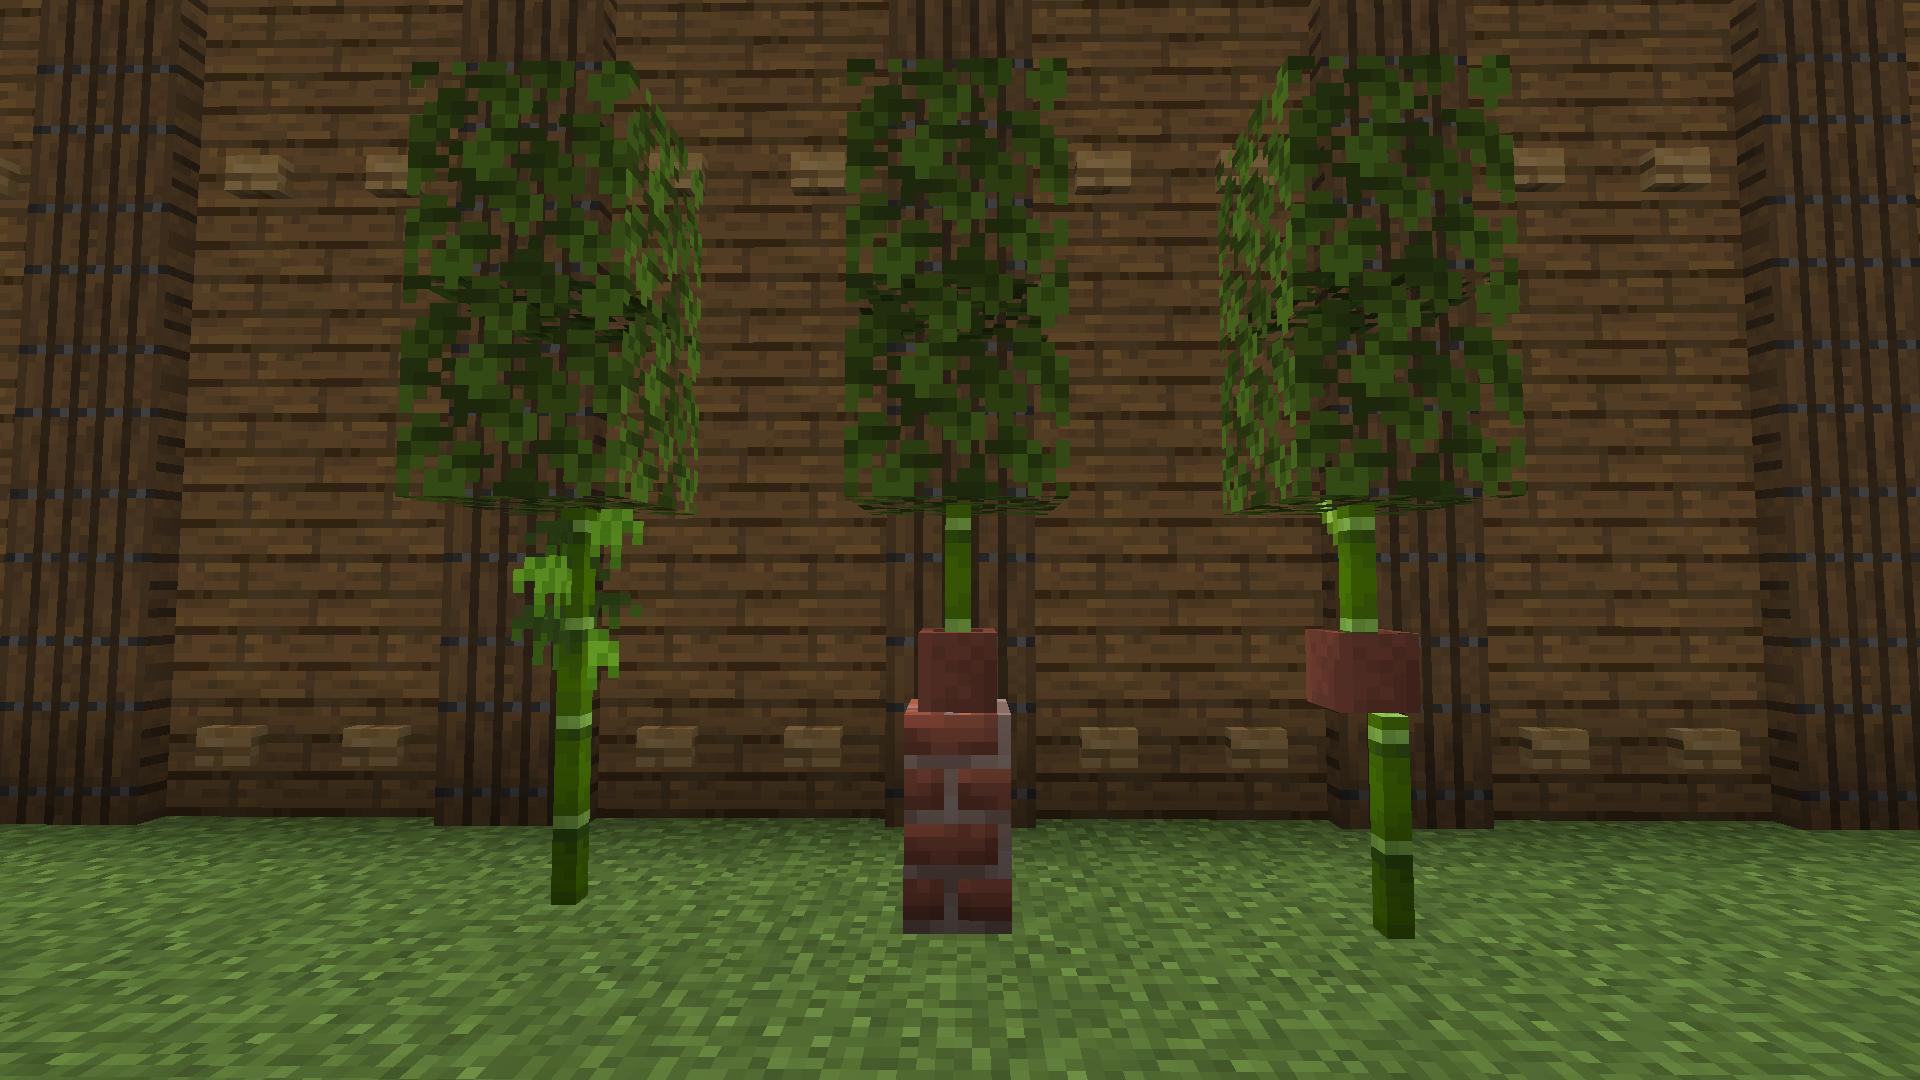 minecraft-1-14-drzewka-bambusowe.png